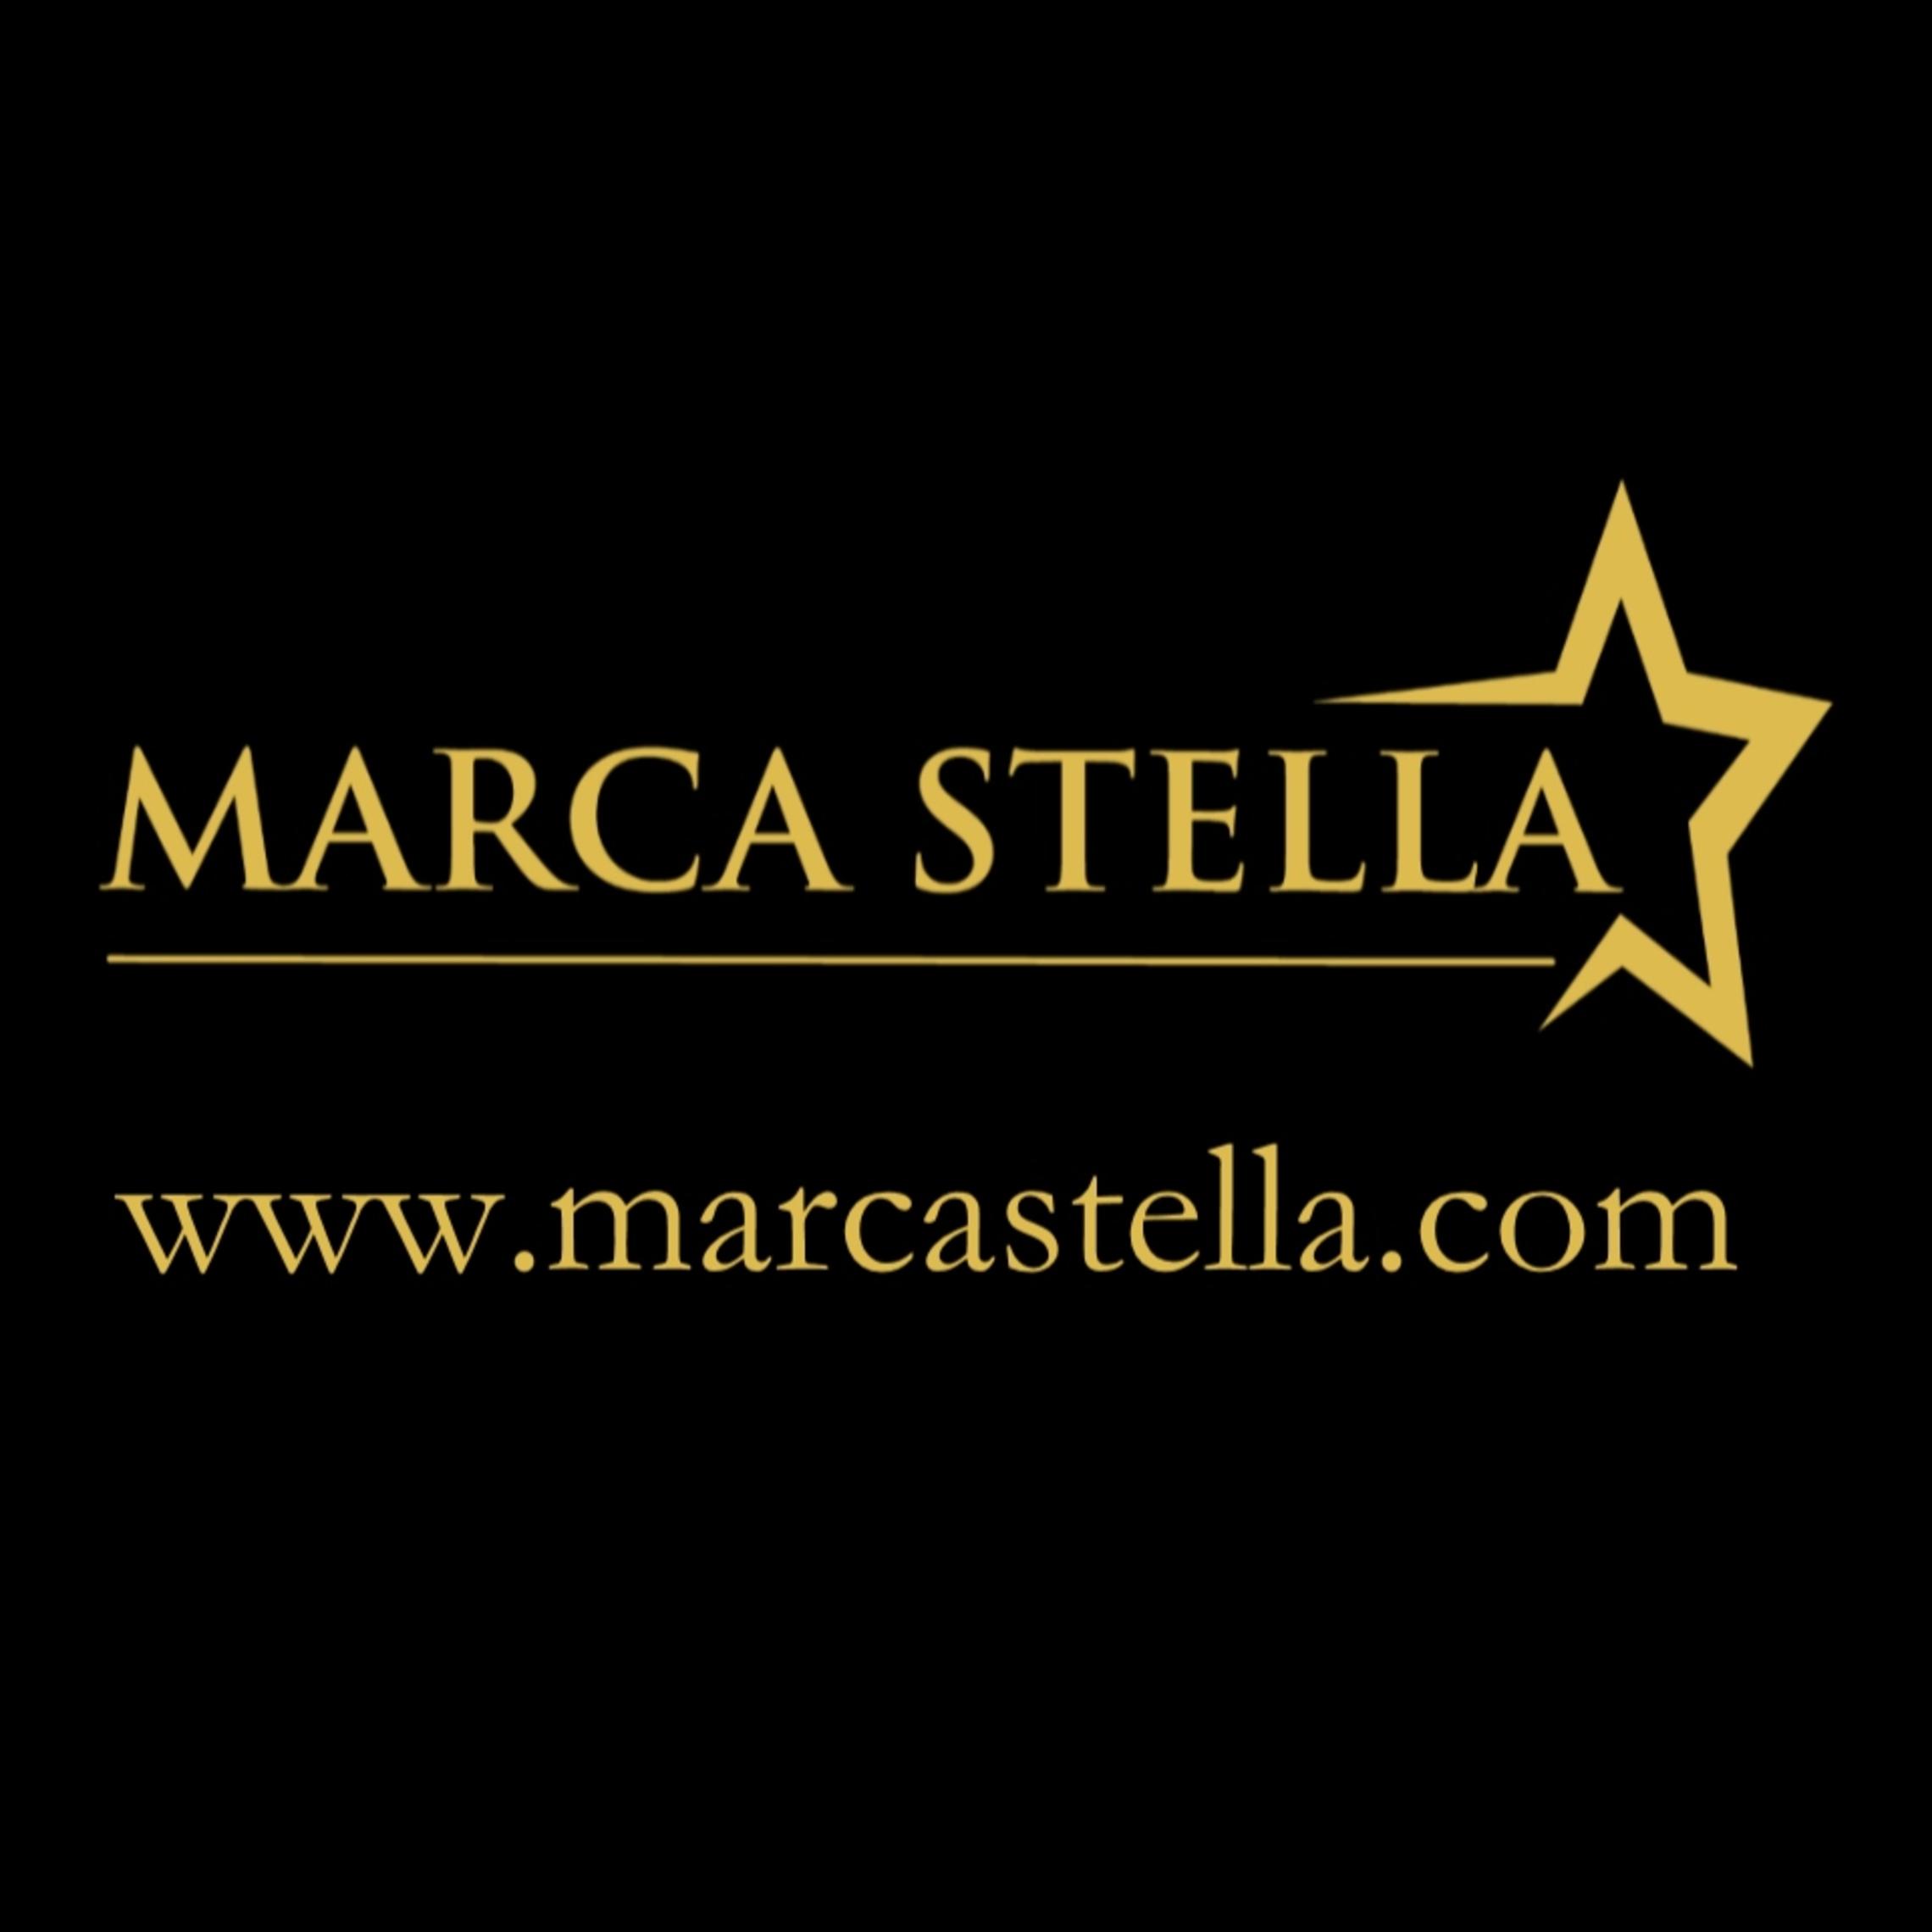 marca stella luxury- company logo